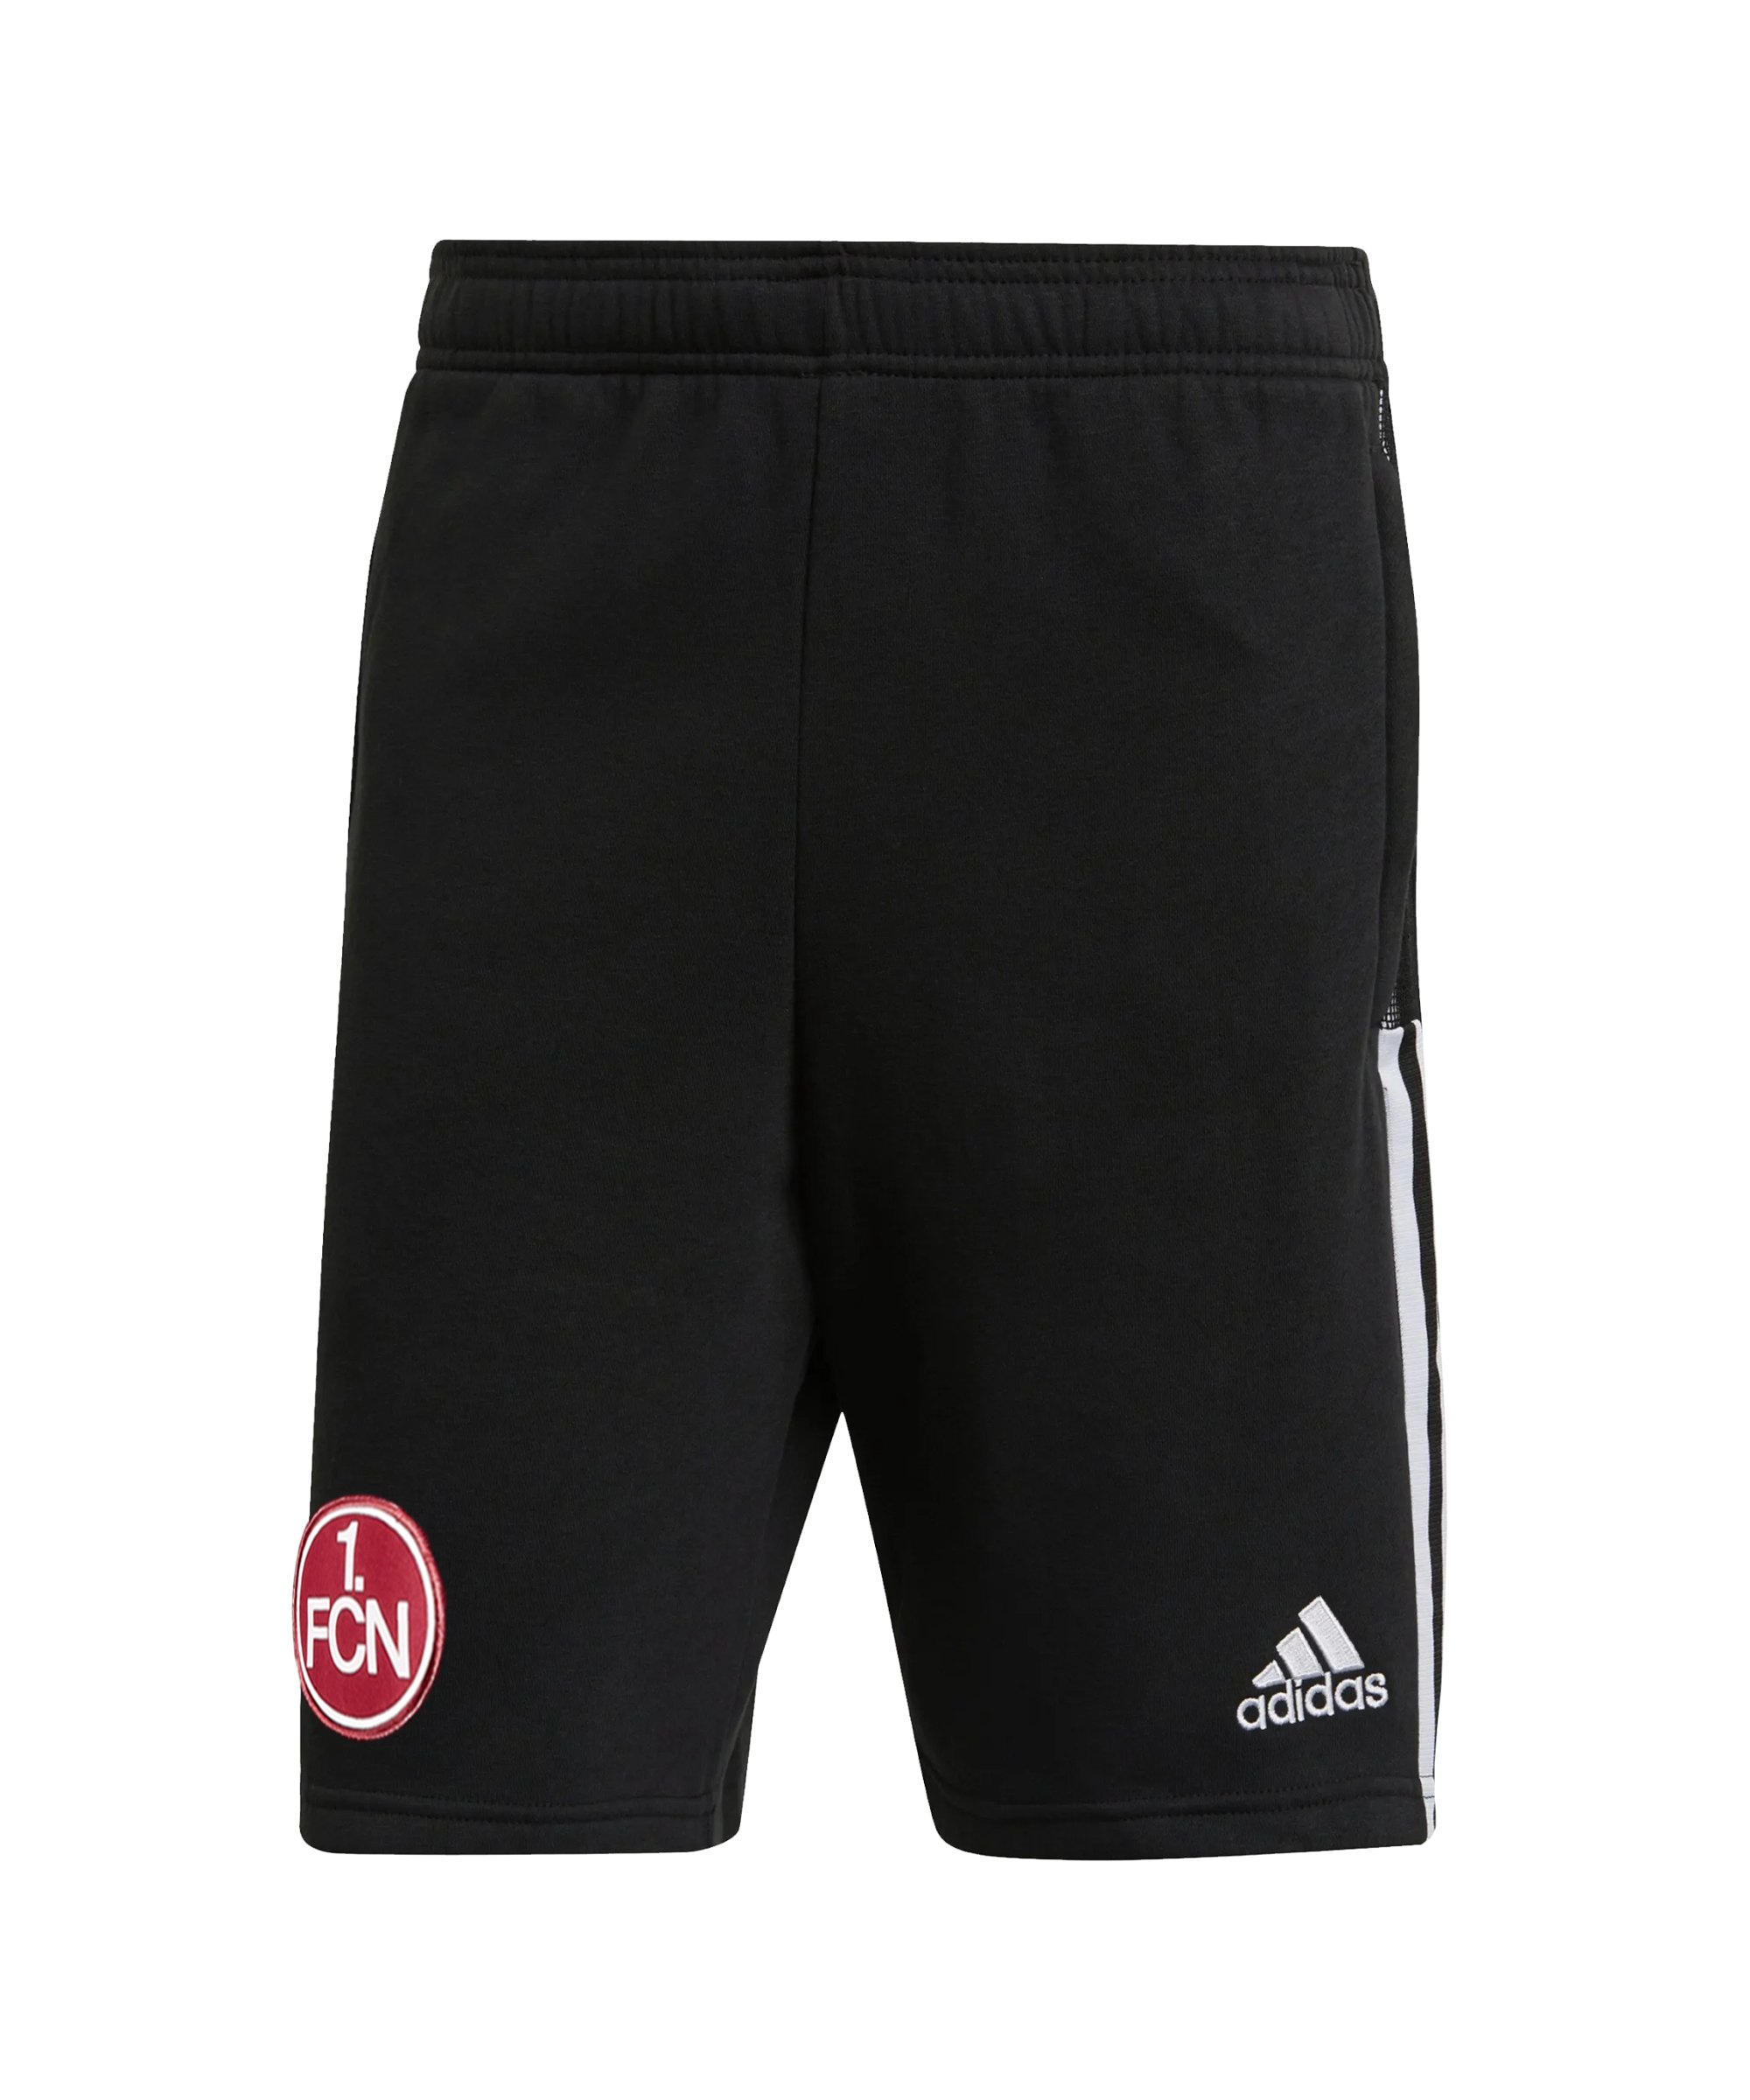 adidas 1. FC Nürnberg Short Schwarz - schwarz